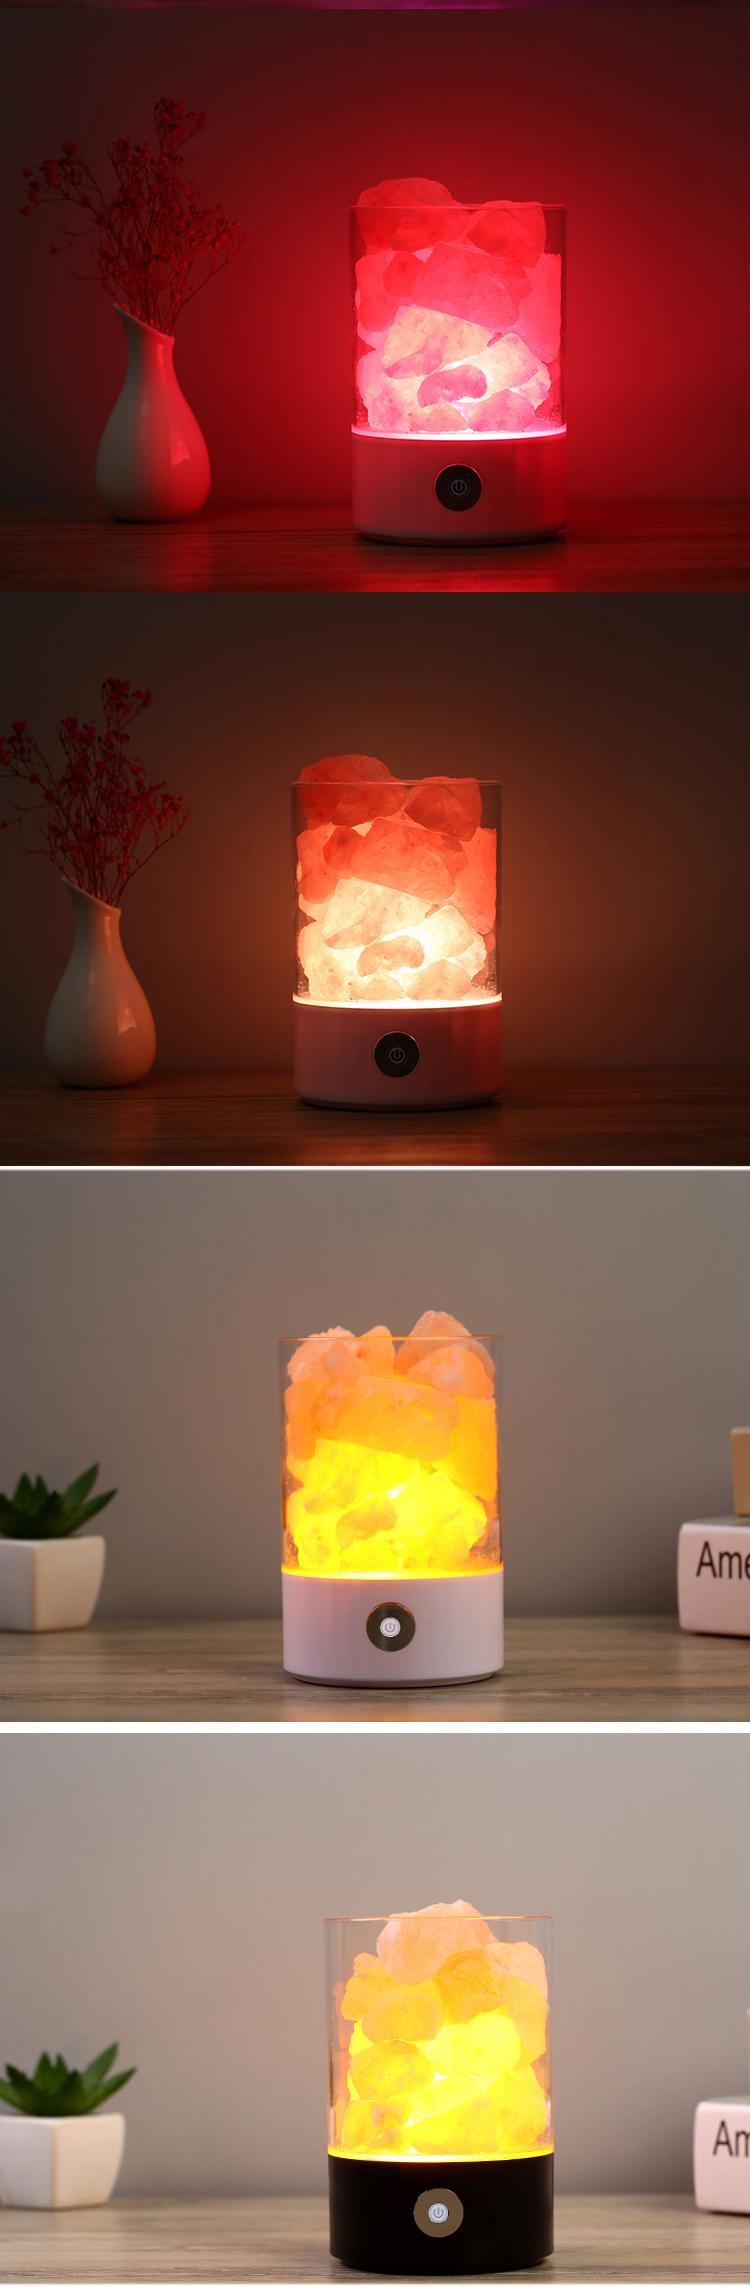 Exclusivo fantasia rosa usb cristal natural himalaia lâmpada de sal luz da noite